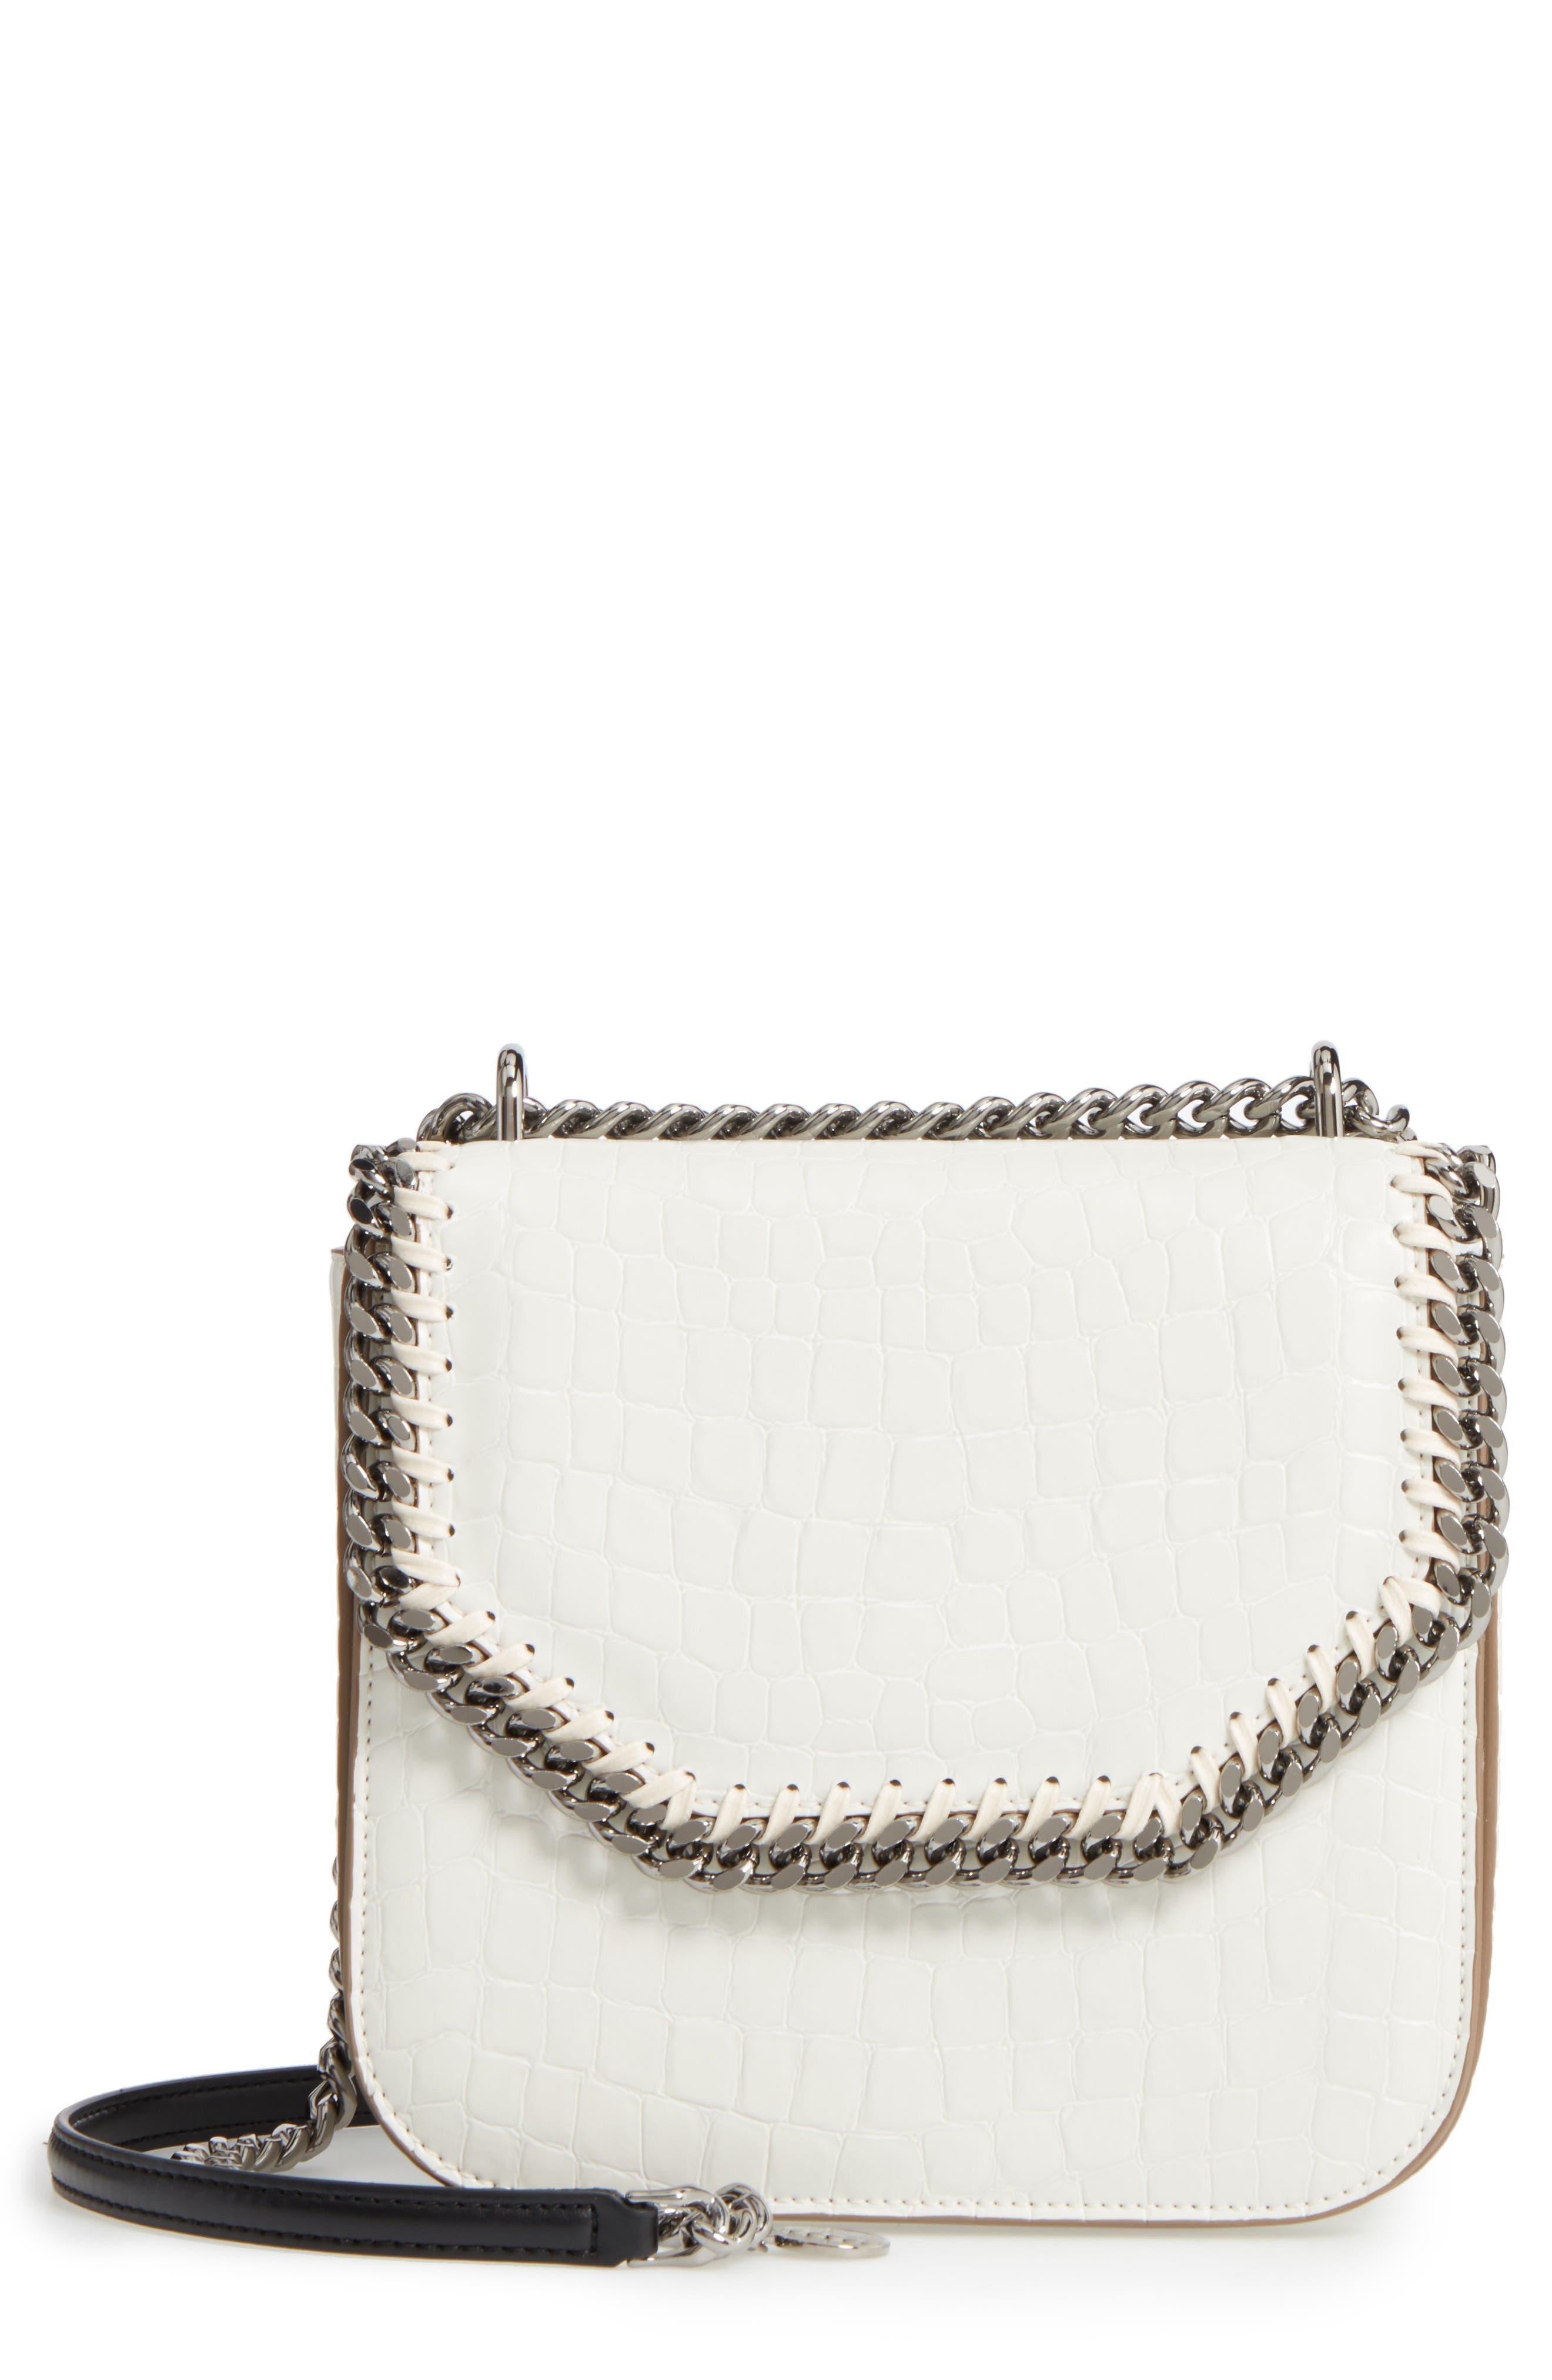 Medium Falabella Box Croc-Embossed Faux Leather Shoulder Bag,                         Main,                         color, 102